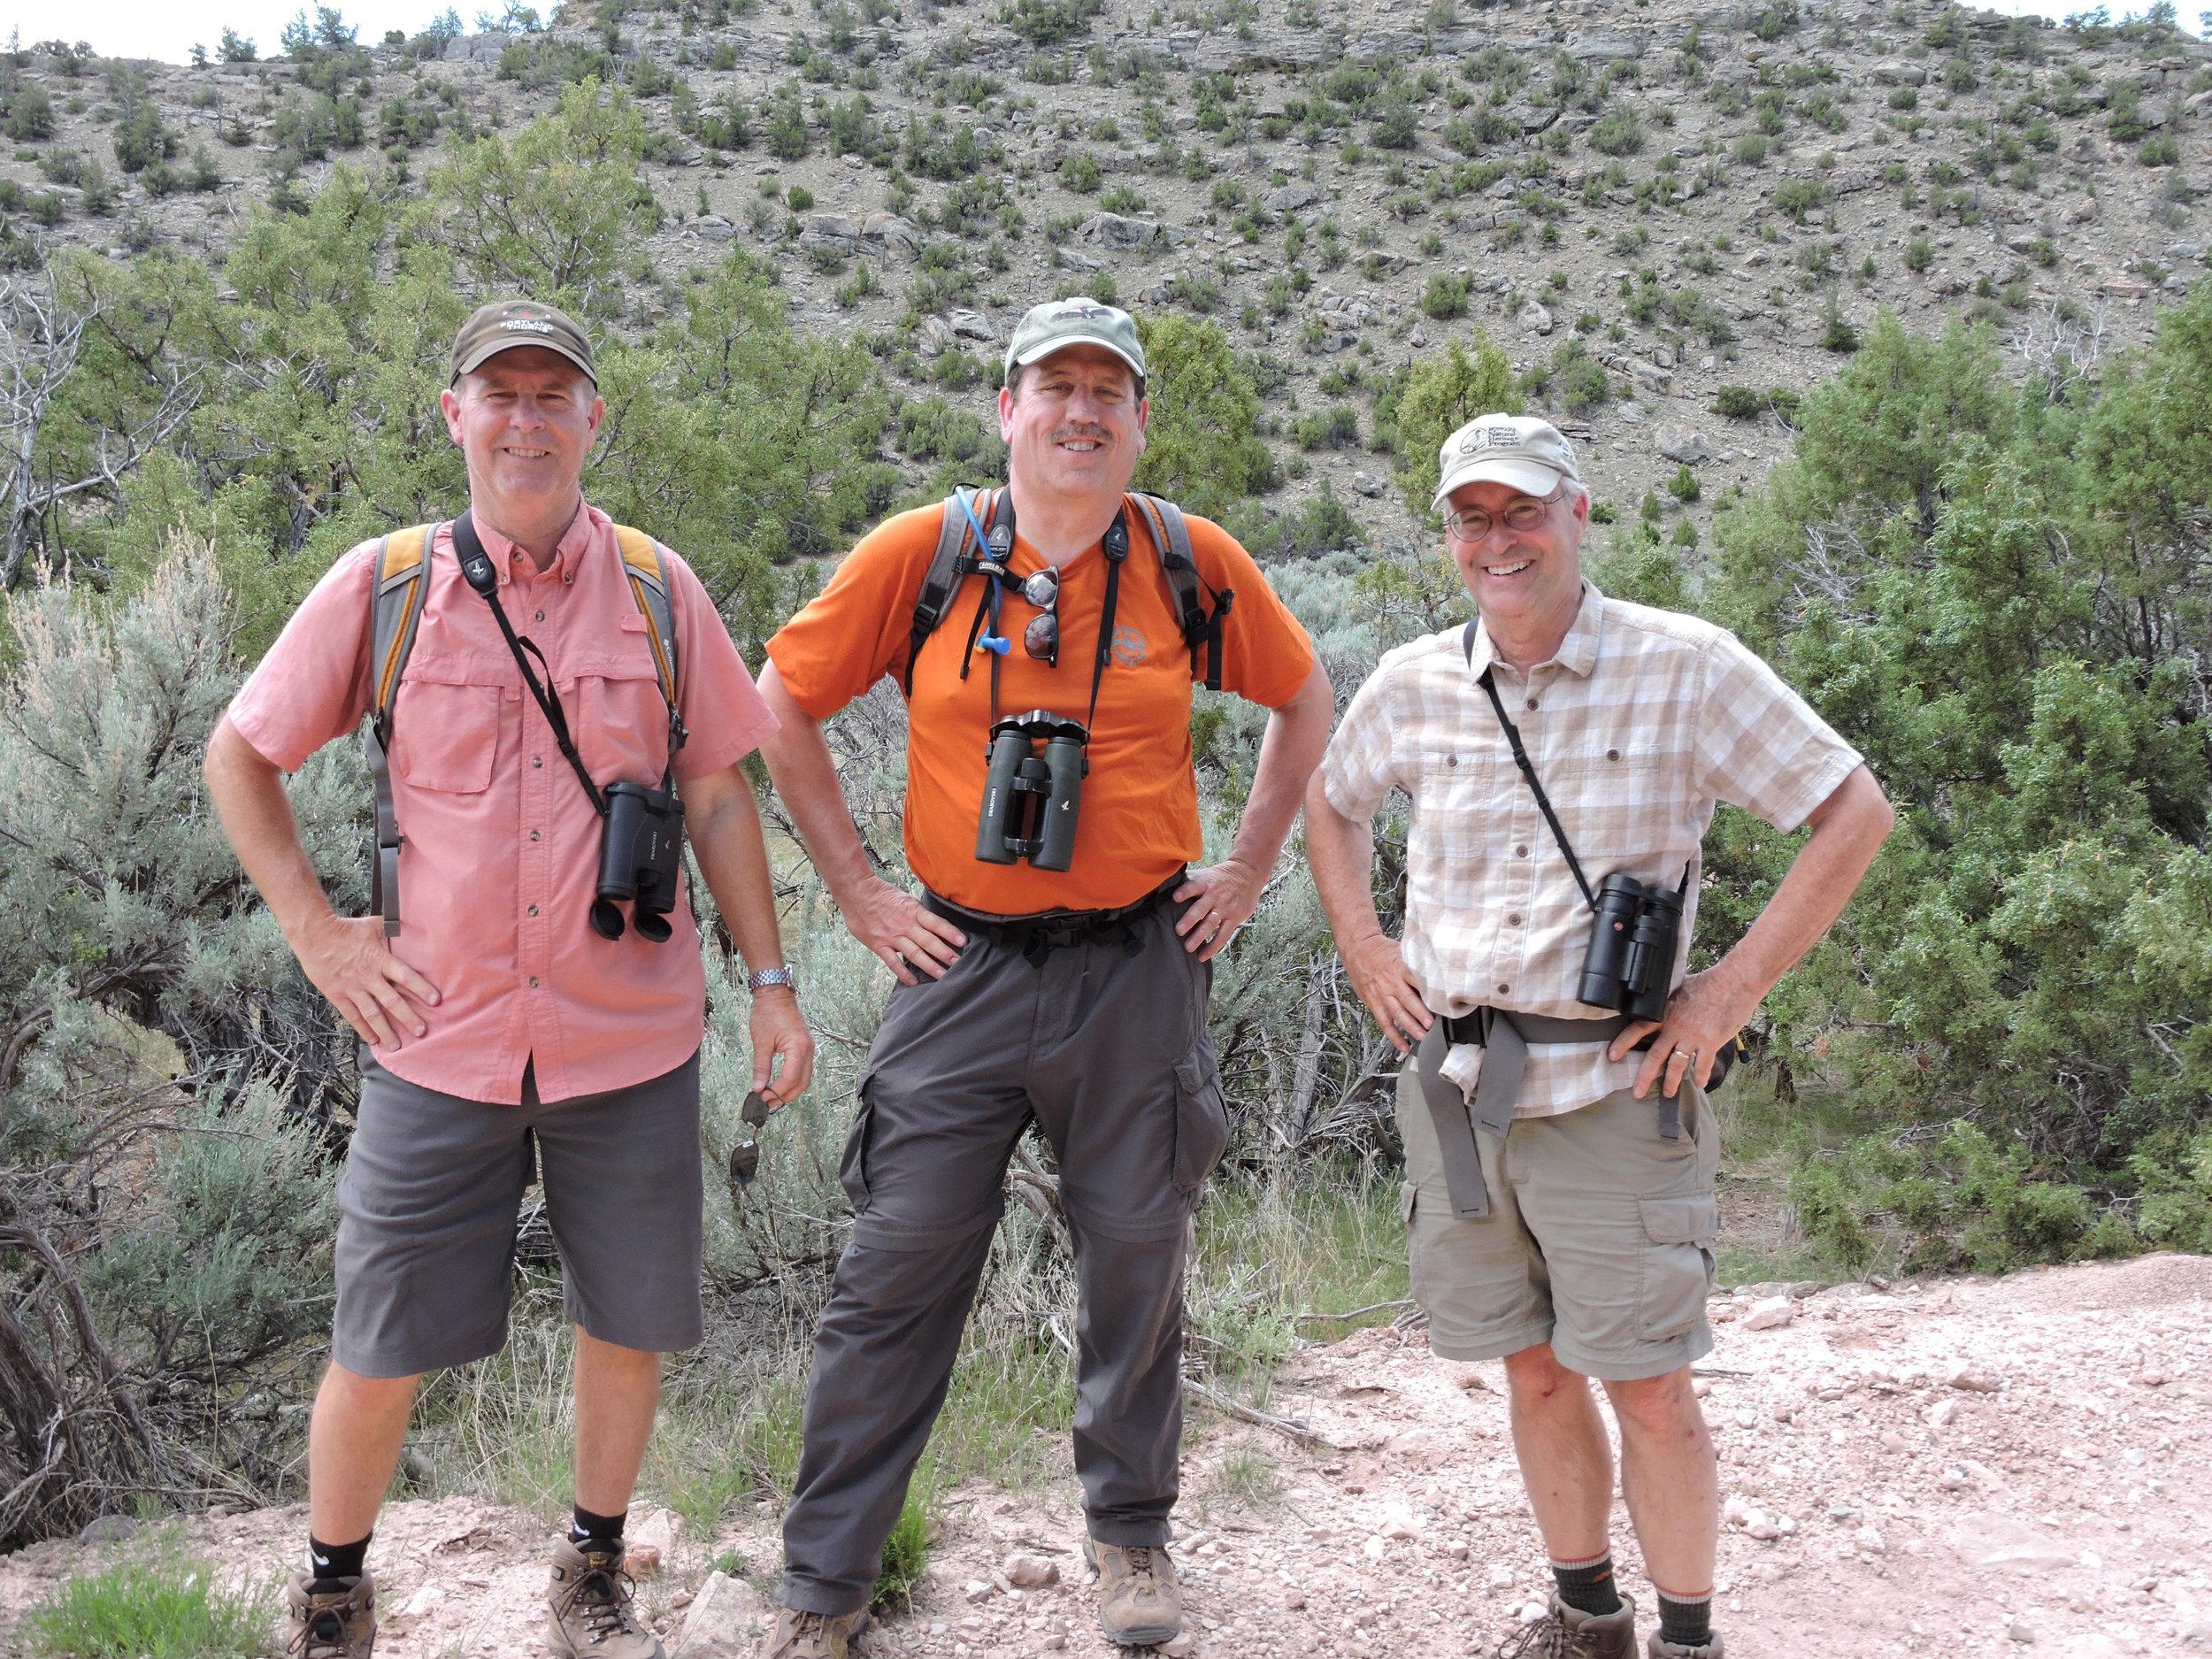 Jeff, Dan, and Paul birding in Bear Canyon, June 2015 (Ron Martin photo)